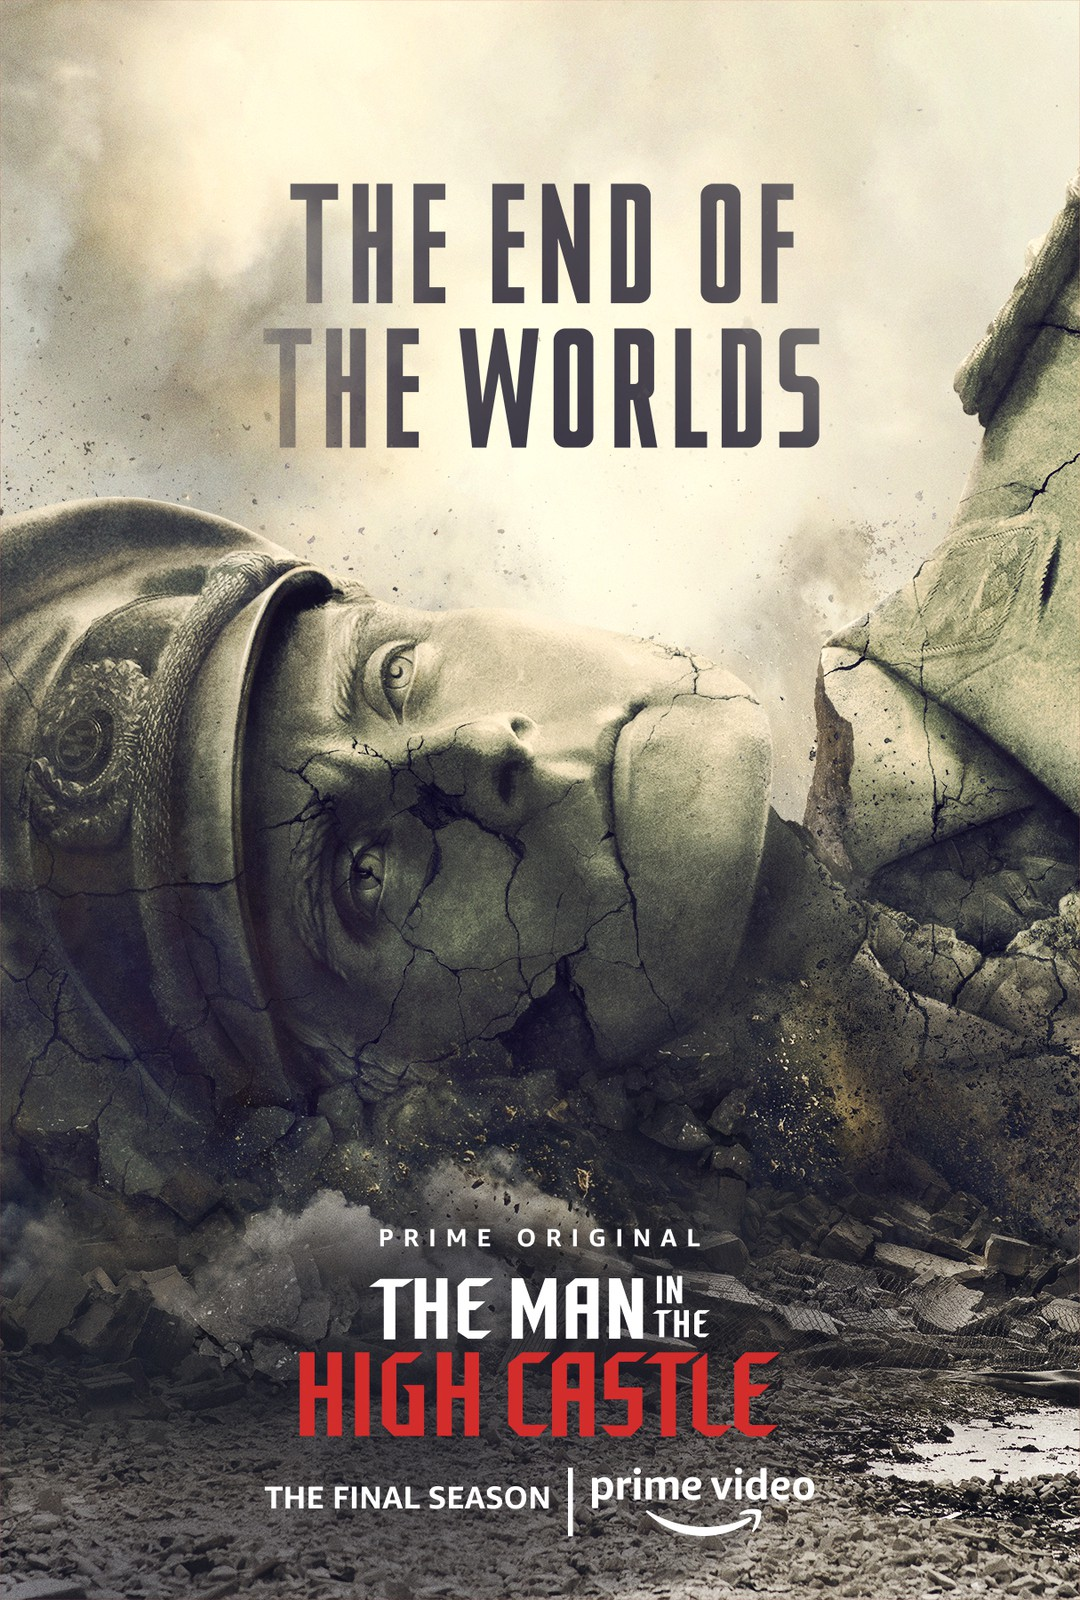 The Man In The High Castle Staffel 4 Starttermin